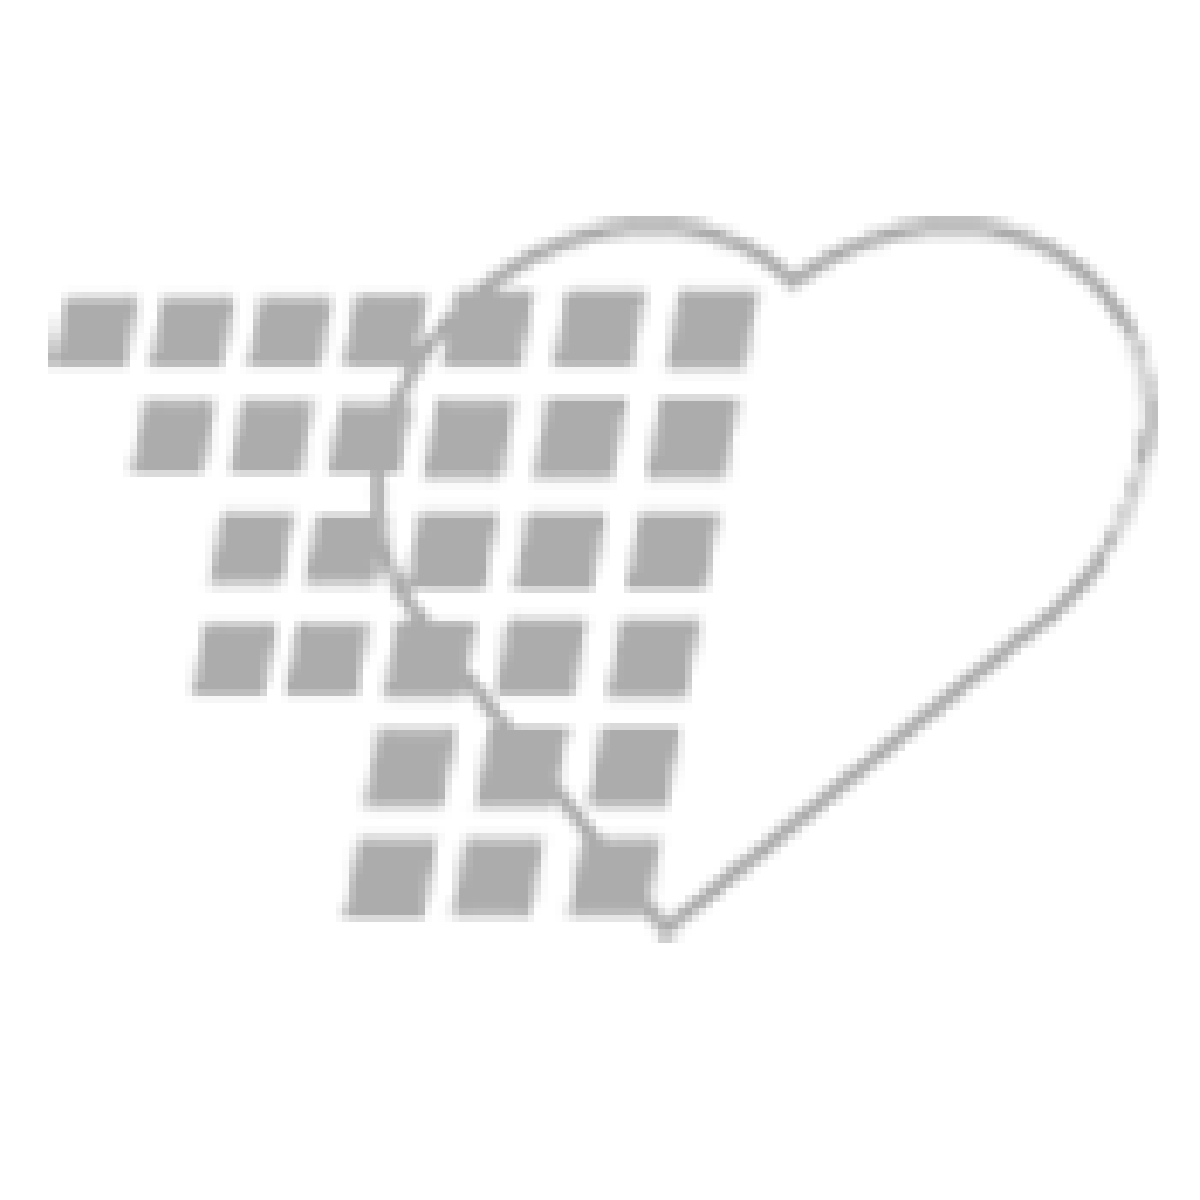 03-32-5524 LYSOL® Brand I.C.™ Foaming Disinfectant Cleaner - (ships ORMD)